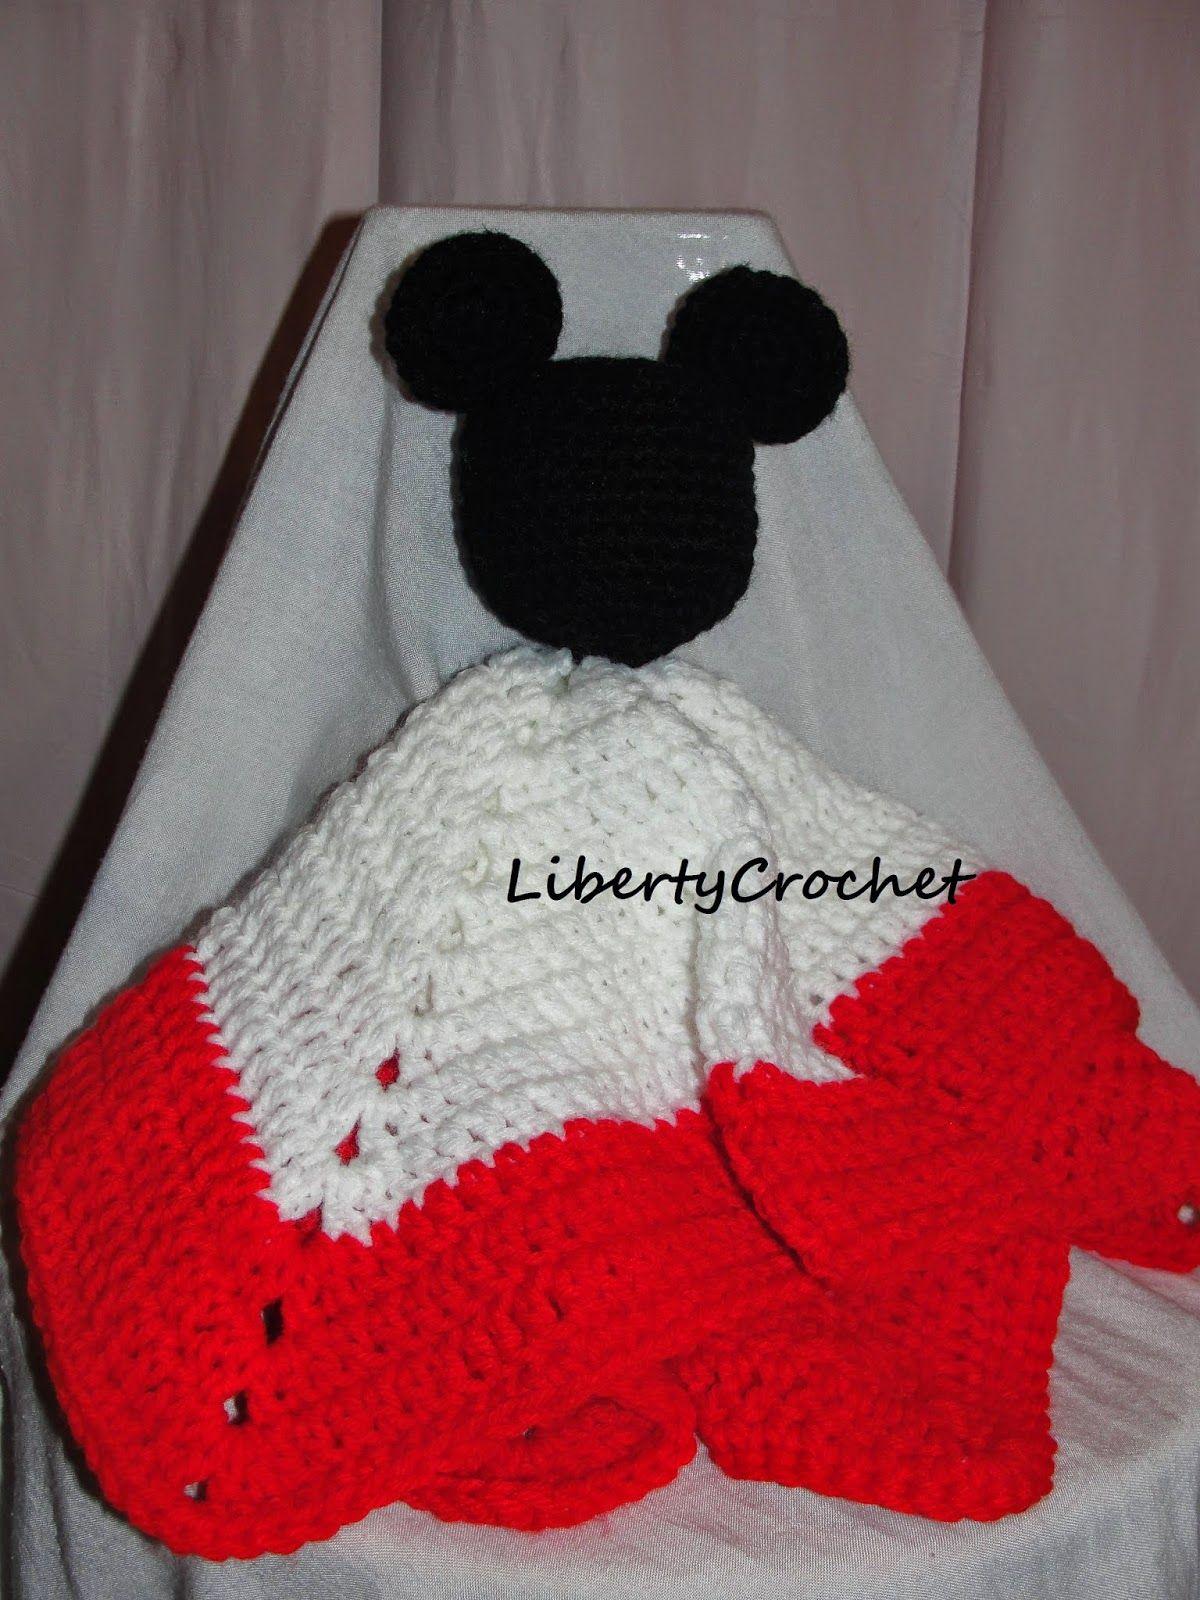 libertycrochet: Mouse head lovey   Crochet Baby Blankets   Pinterest ...